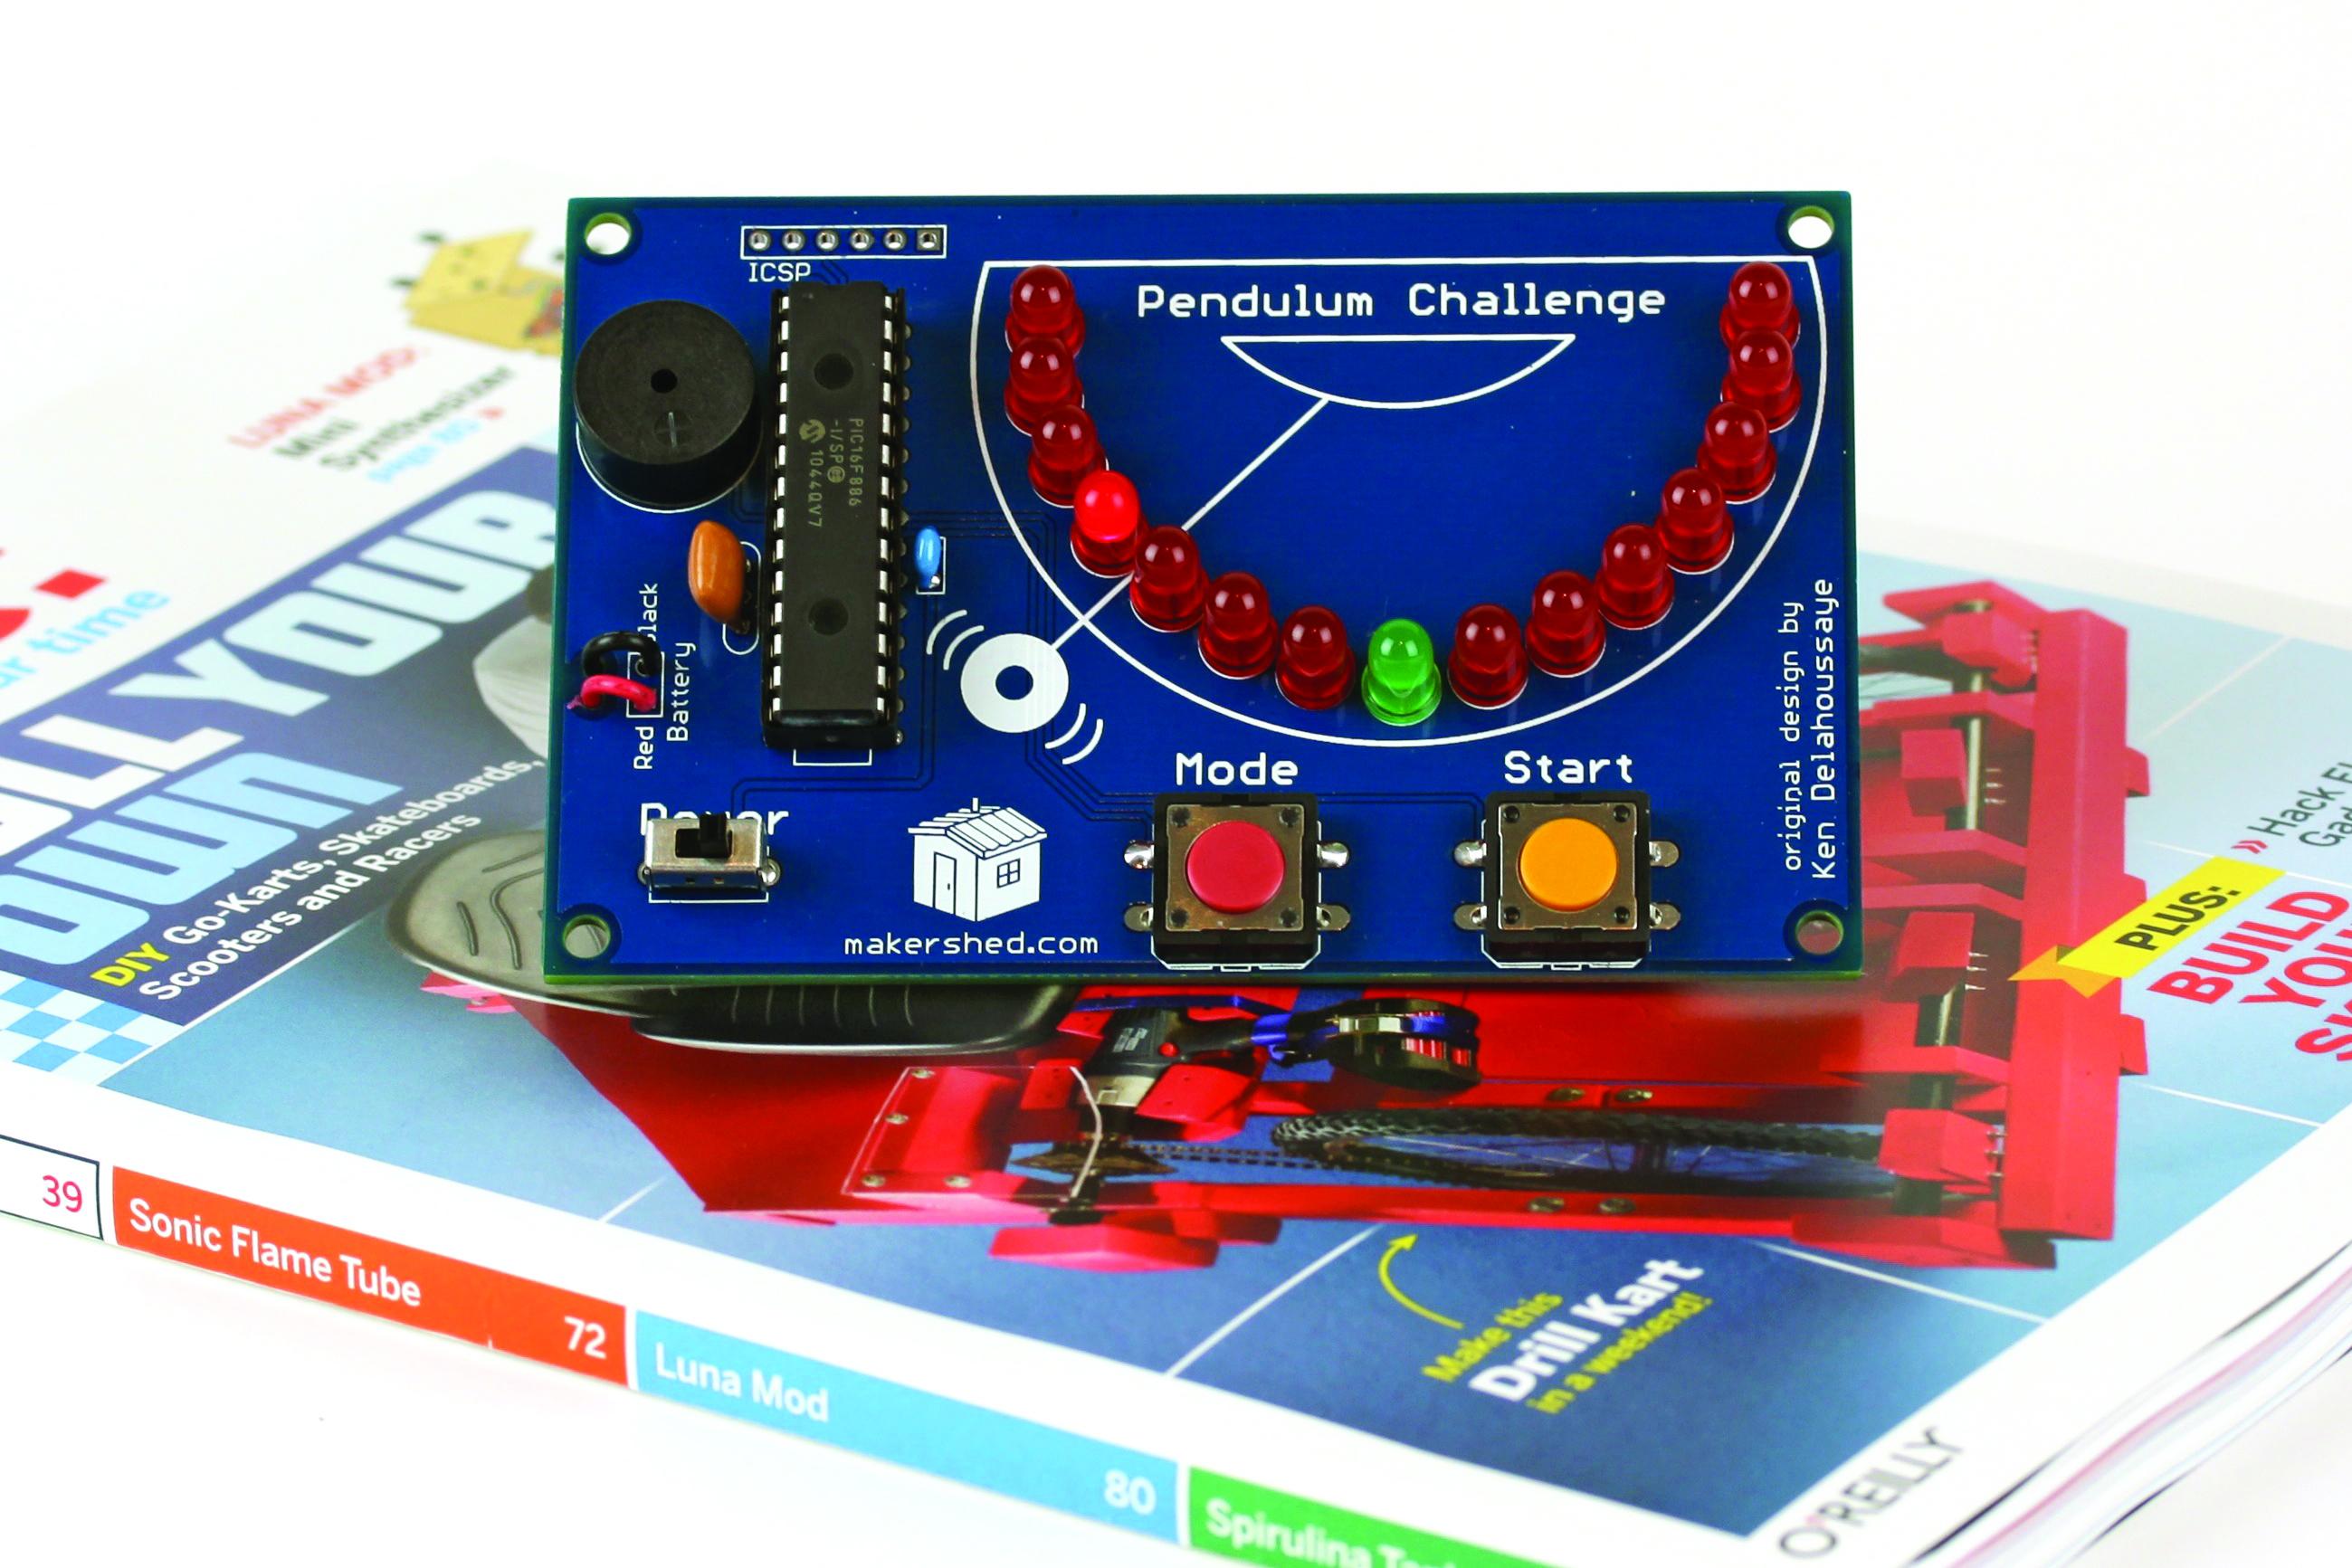 Pendulum Challenge